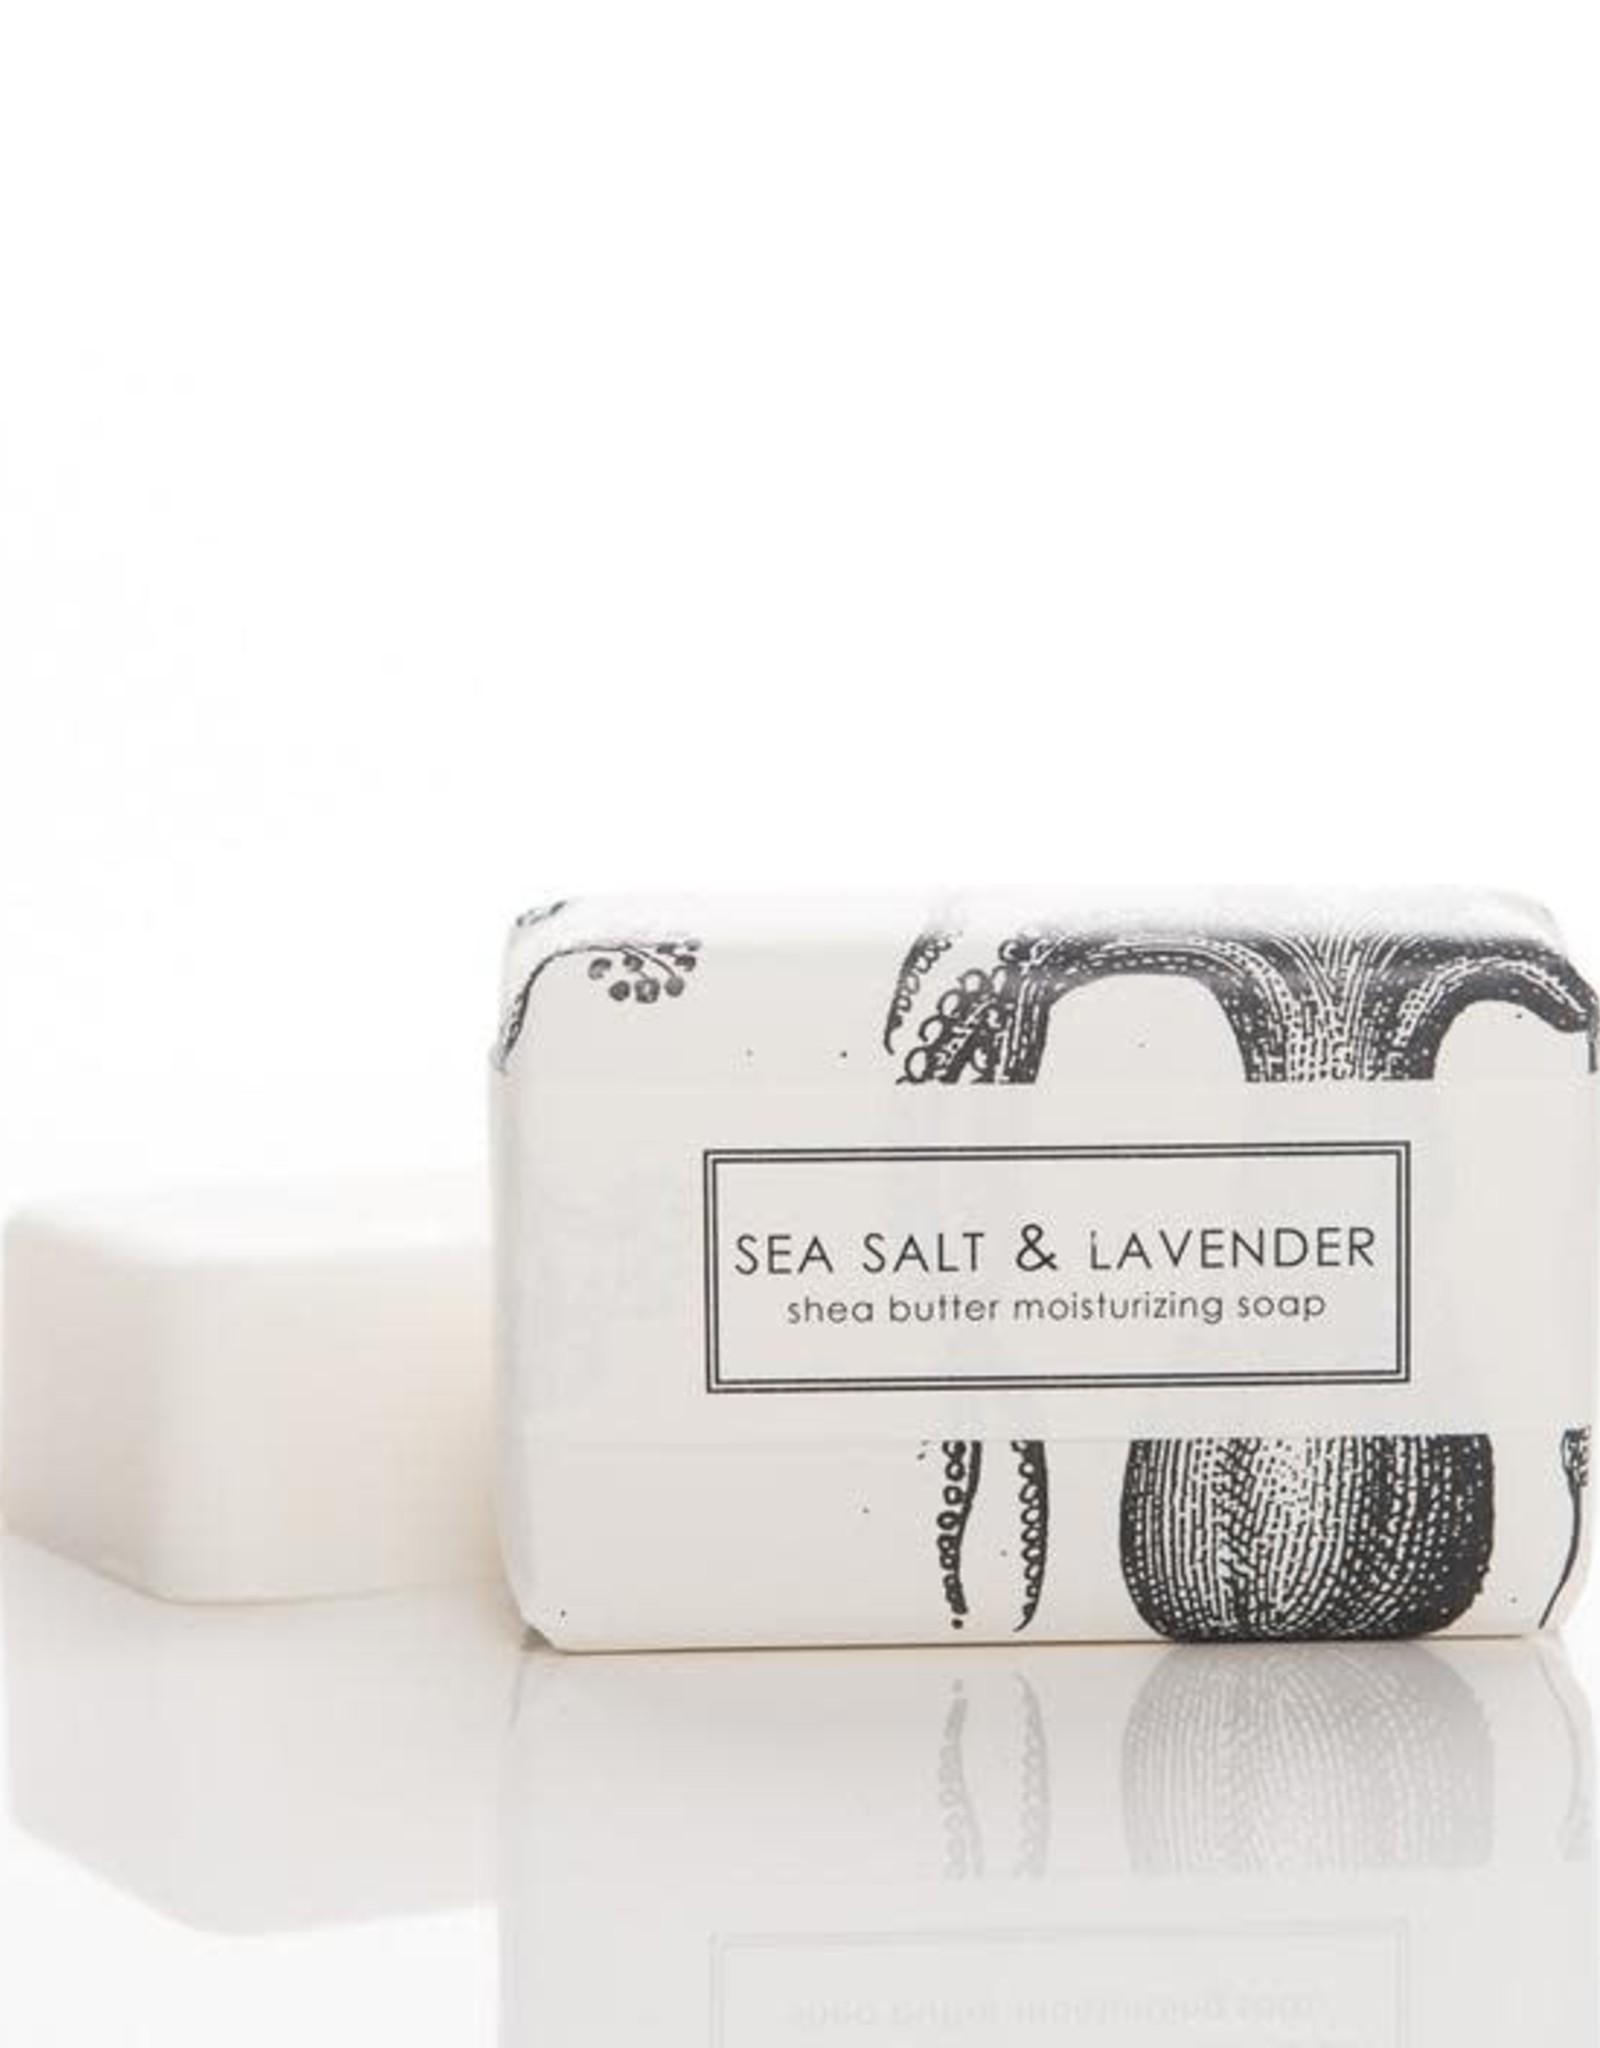 Formulary 55 Sea Salt & Lavender Soap